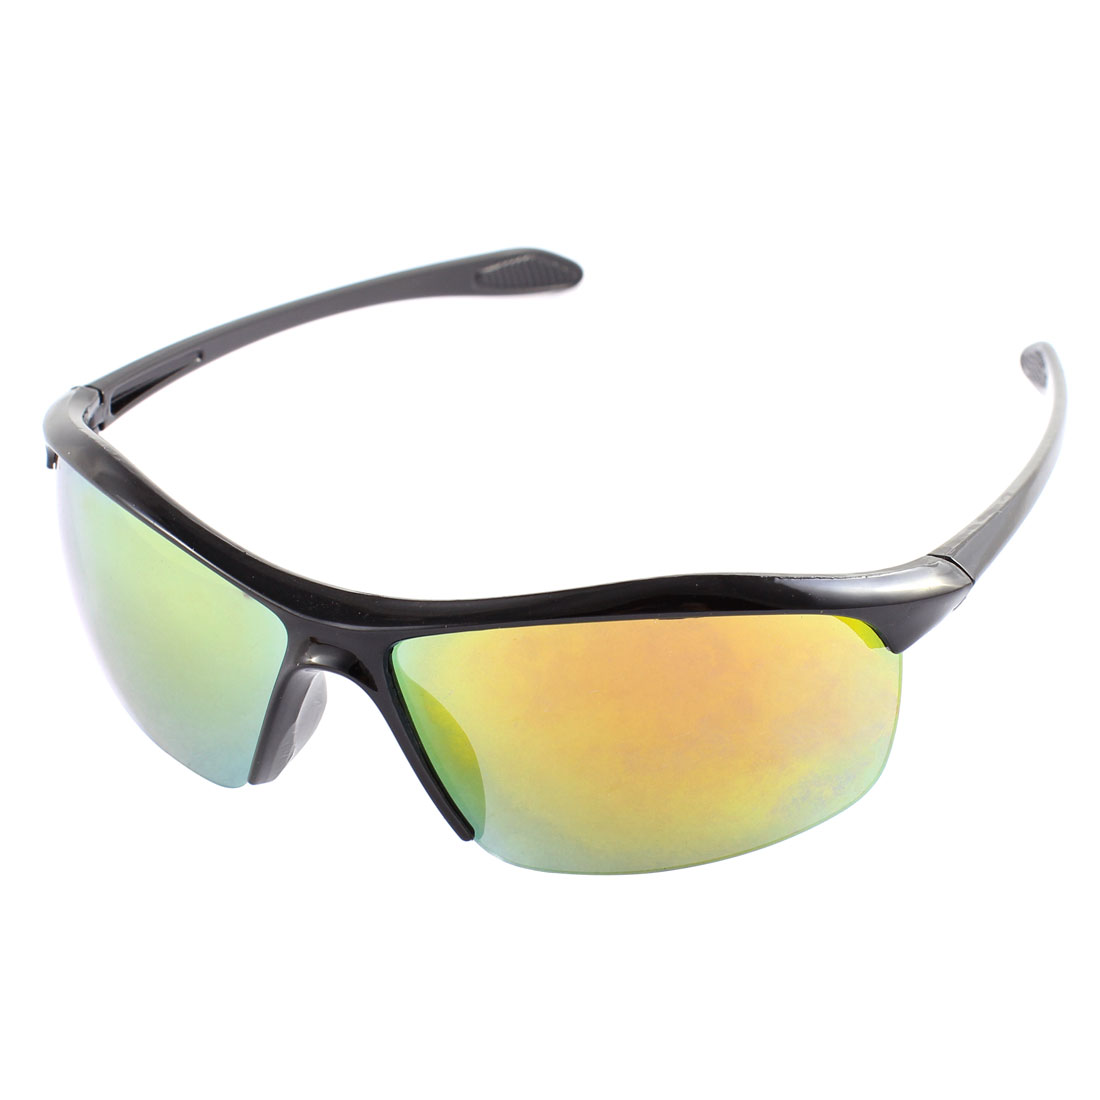 Fashionable Outdoor Single Bridge Leisure Wearglasses Sunglasses Glasses